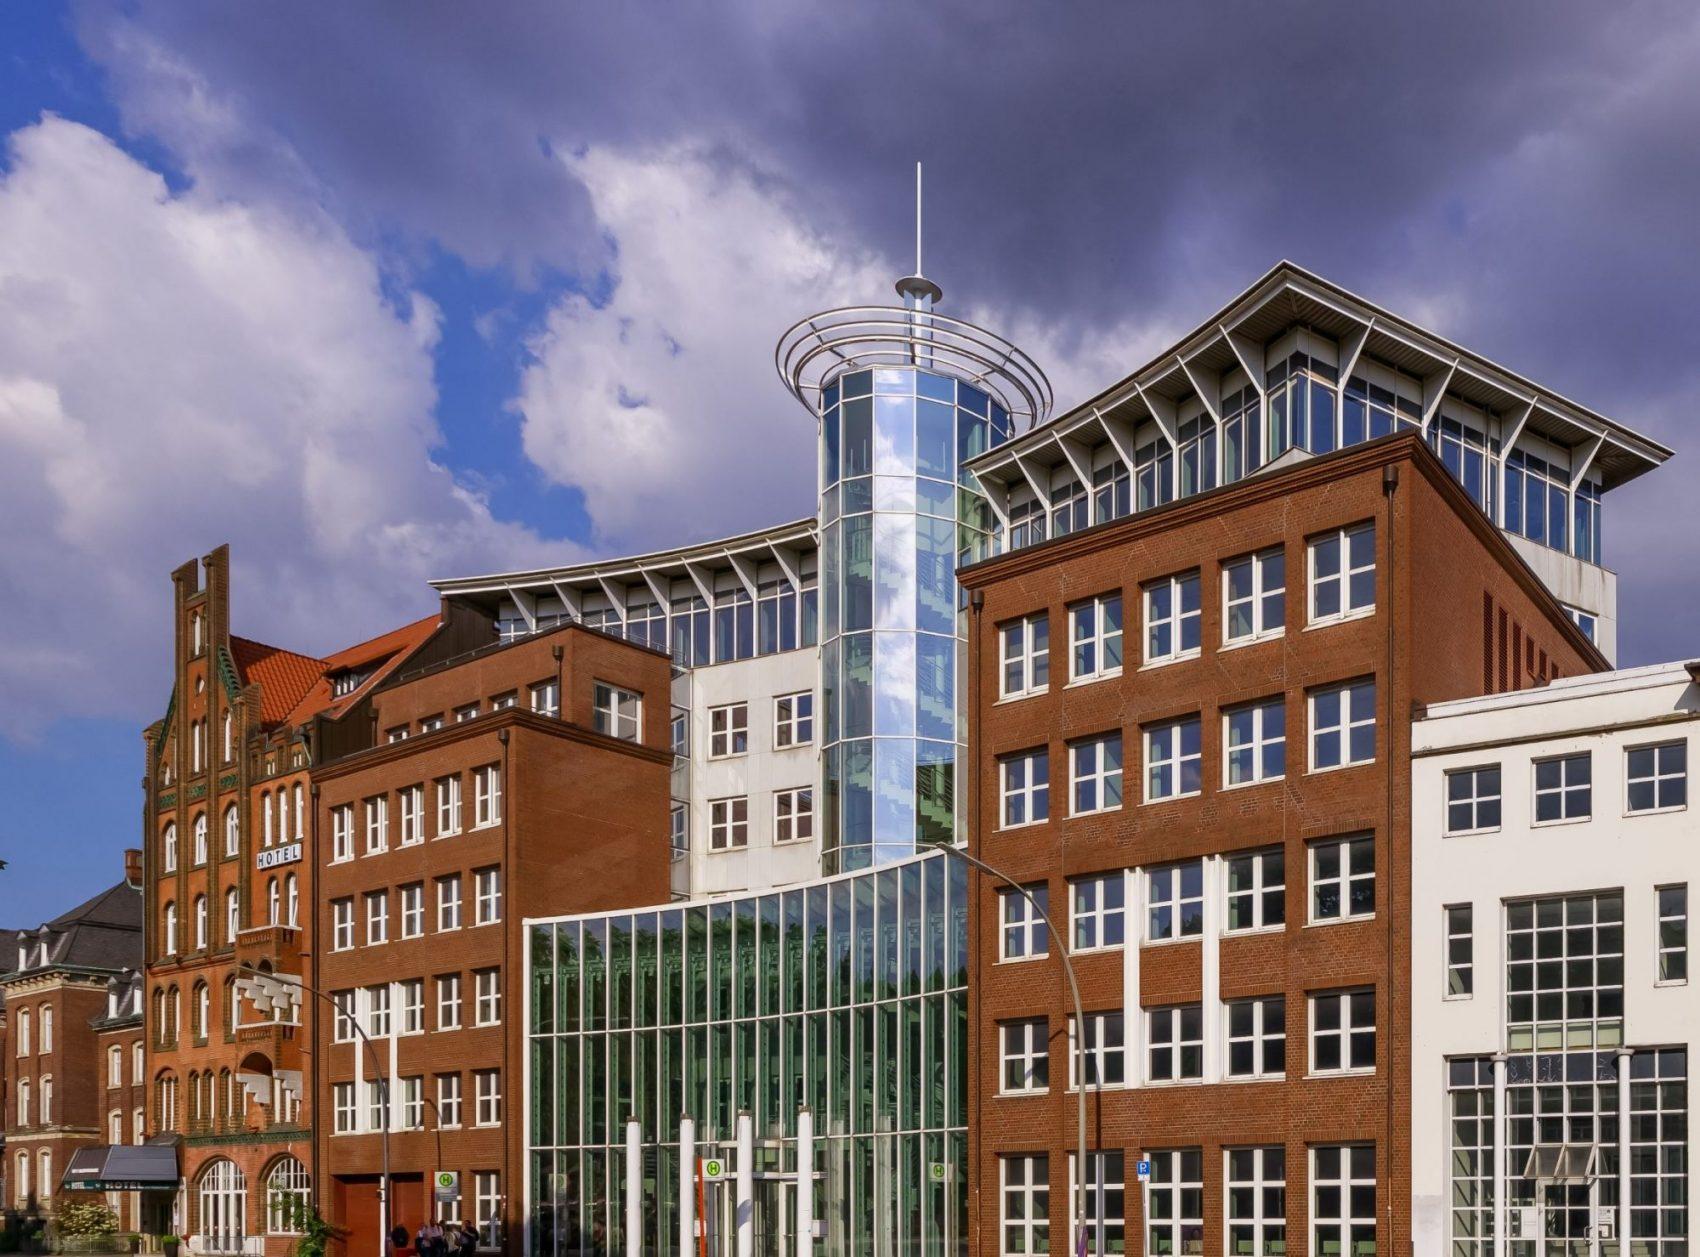 DFI - Hamburg Investment Opportunity